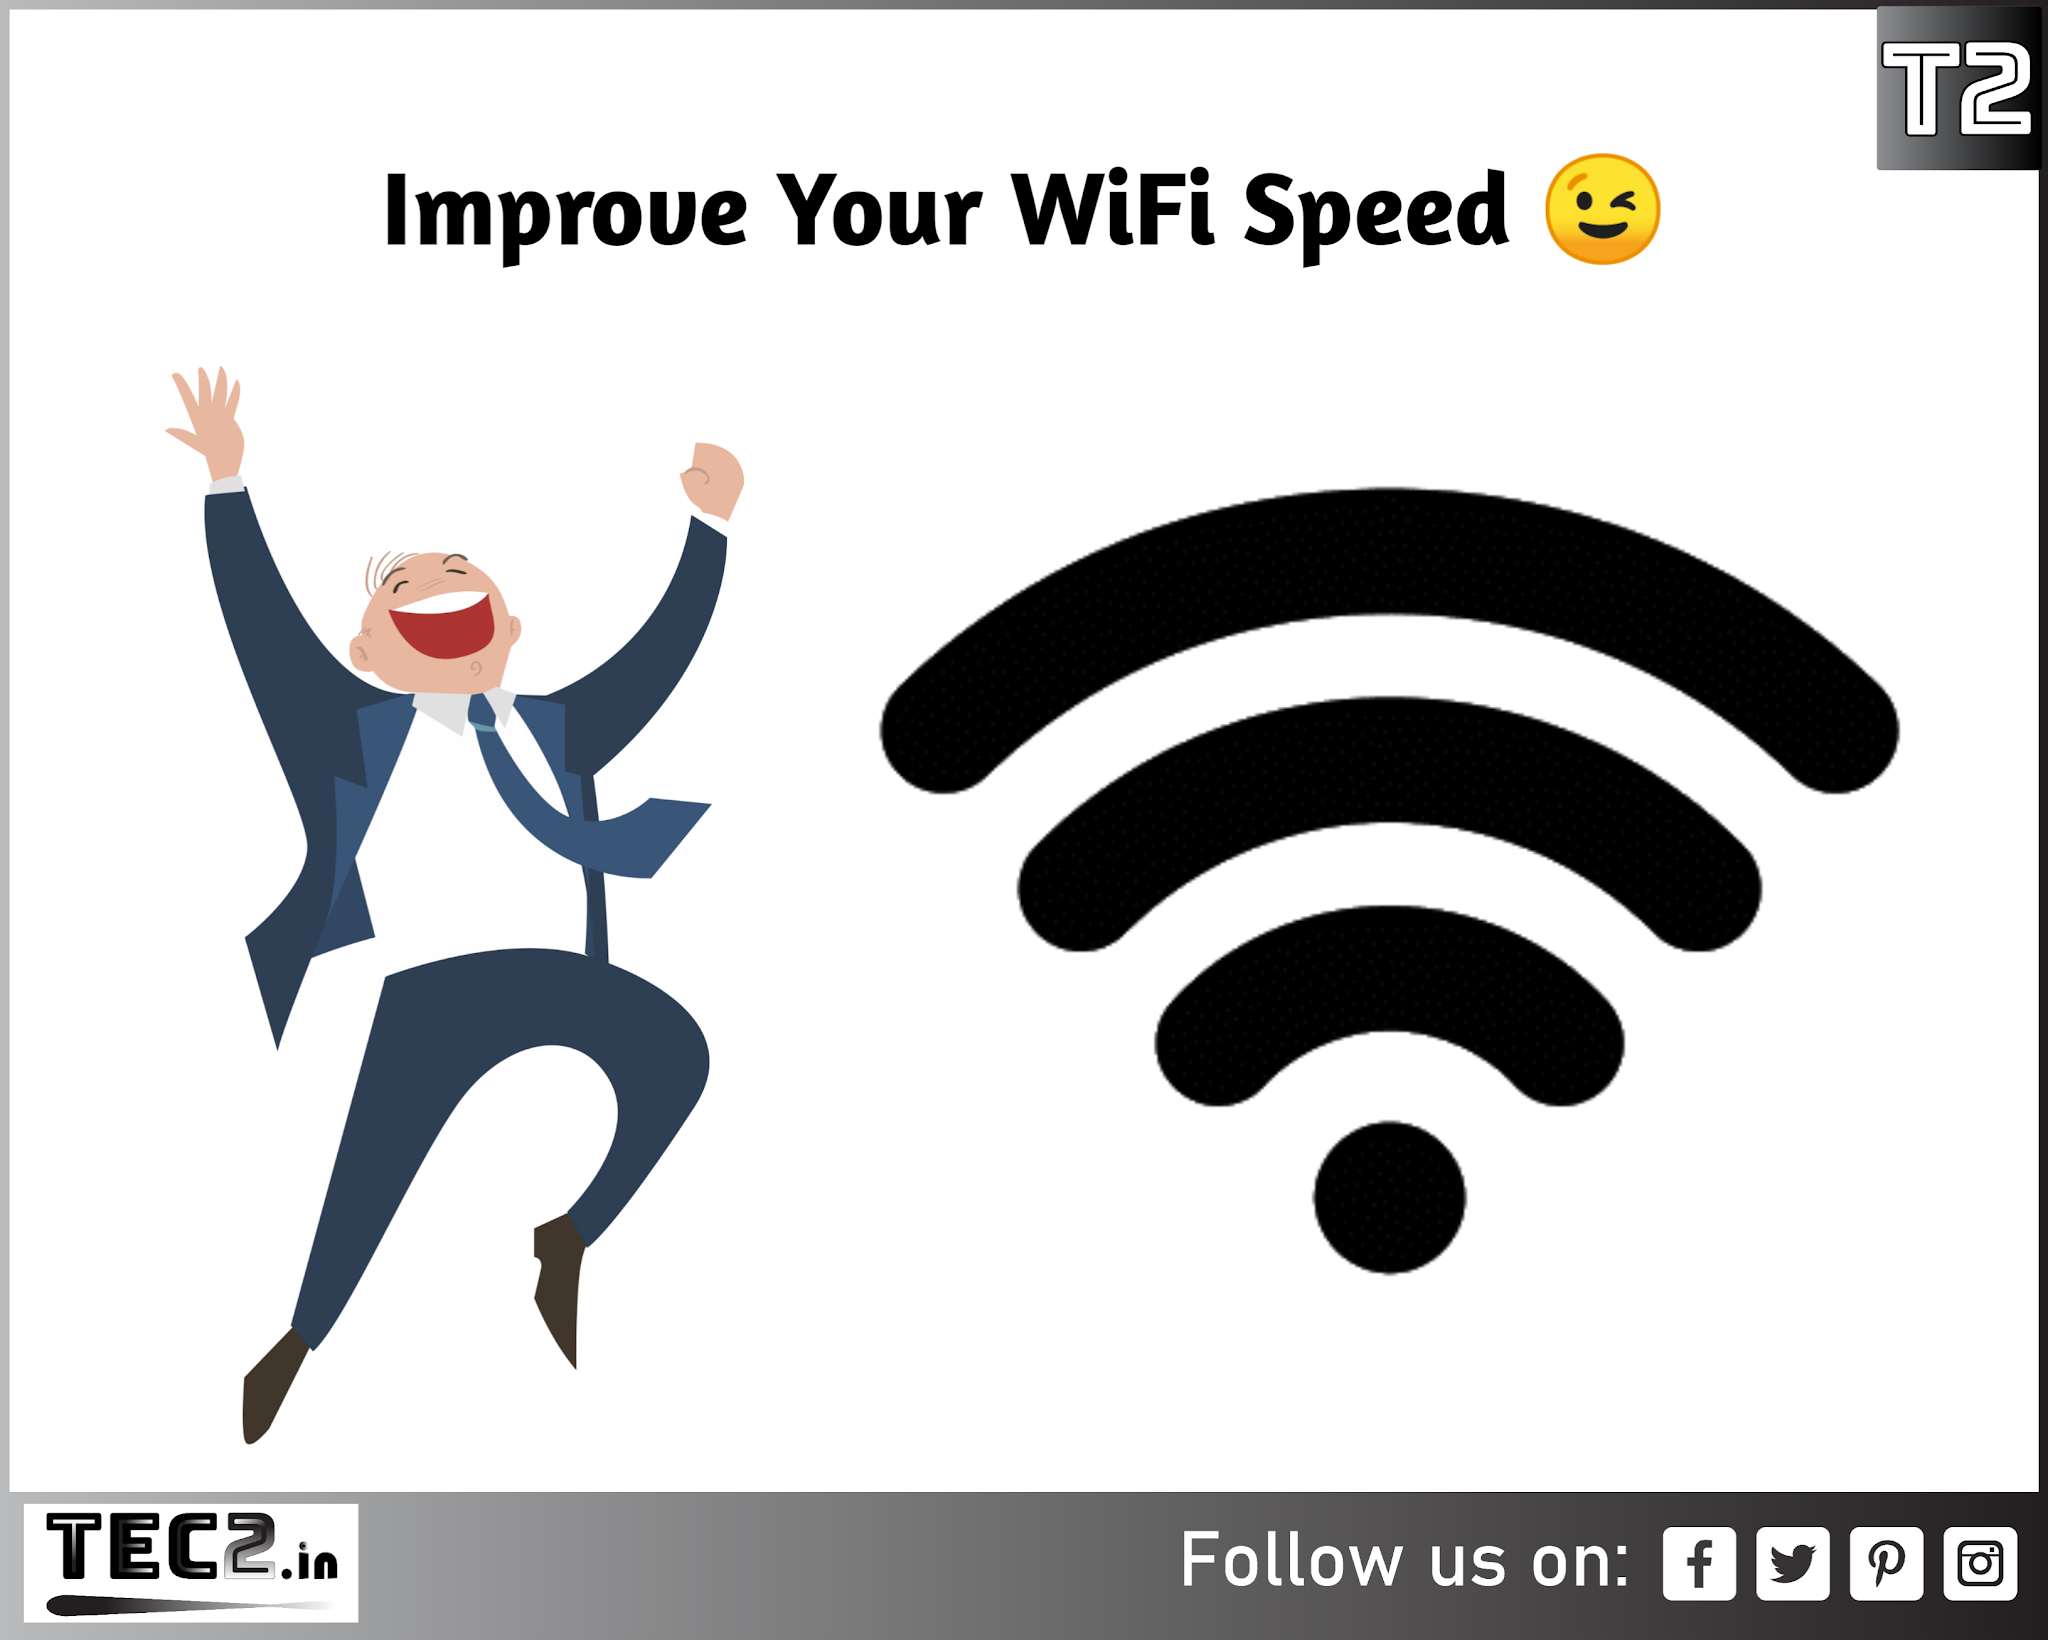 Improve your Wi-Fi